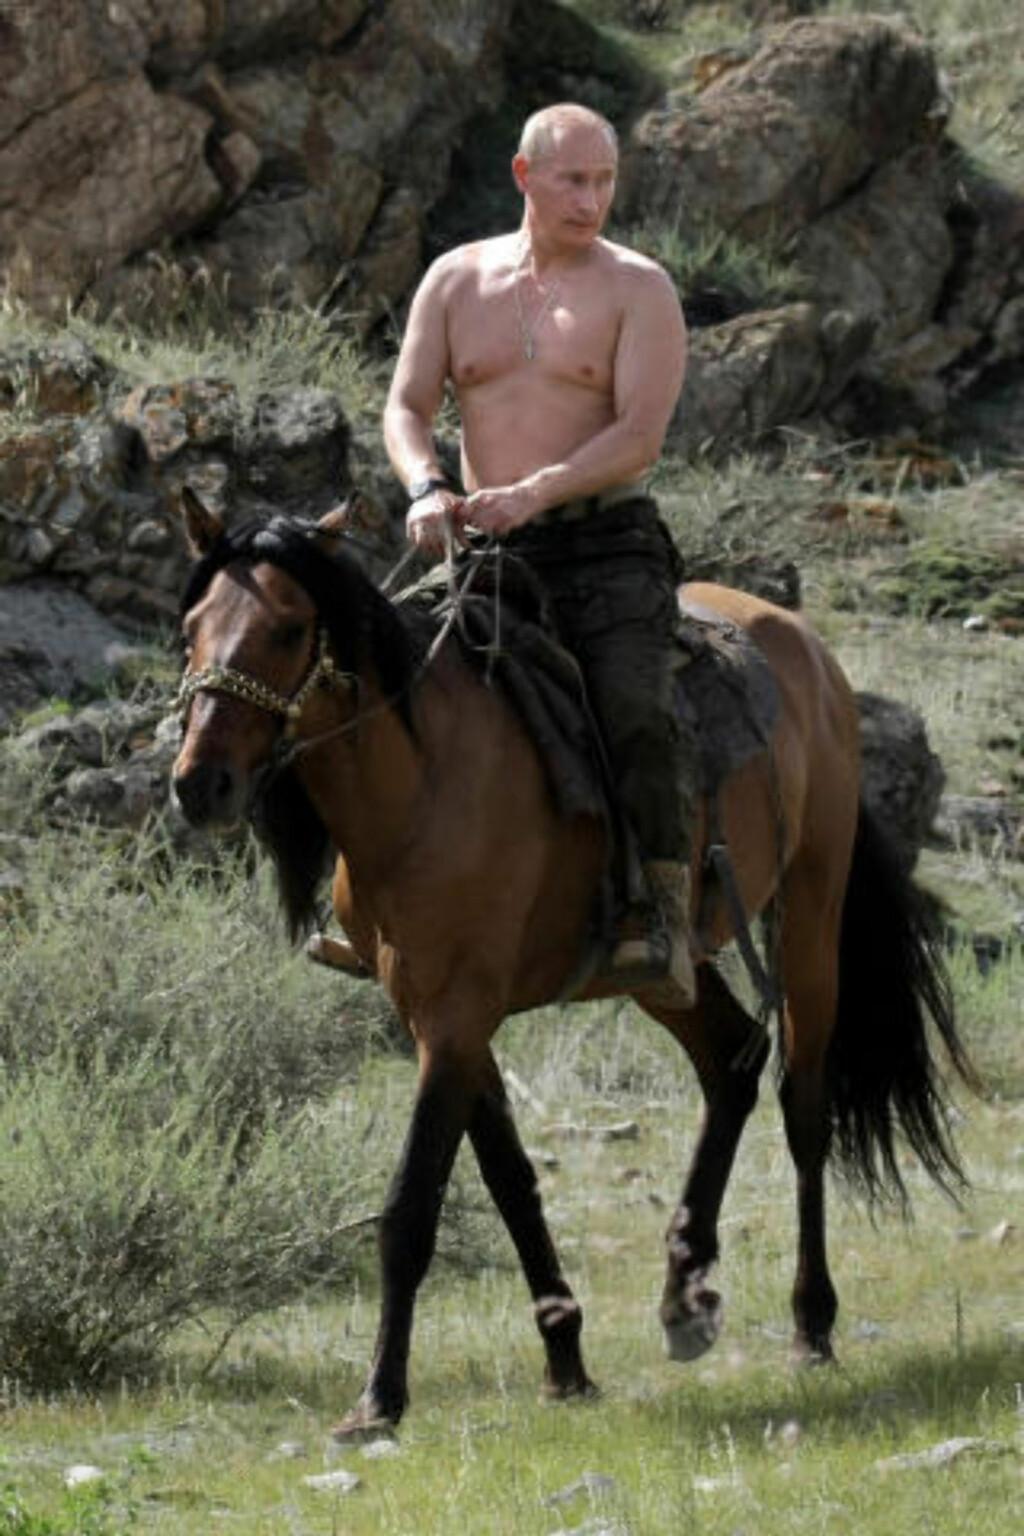 RIDENDE RYTTER: Vladimir Putin på hesteryggen i Sibir tidligere denne uka.  Foto: AFP PHOTO /RIA-NOVOSTI/ALEXEY DRUZHININ/SCANPIX